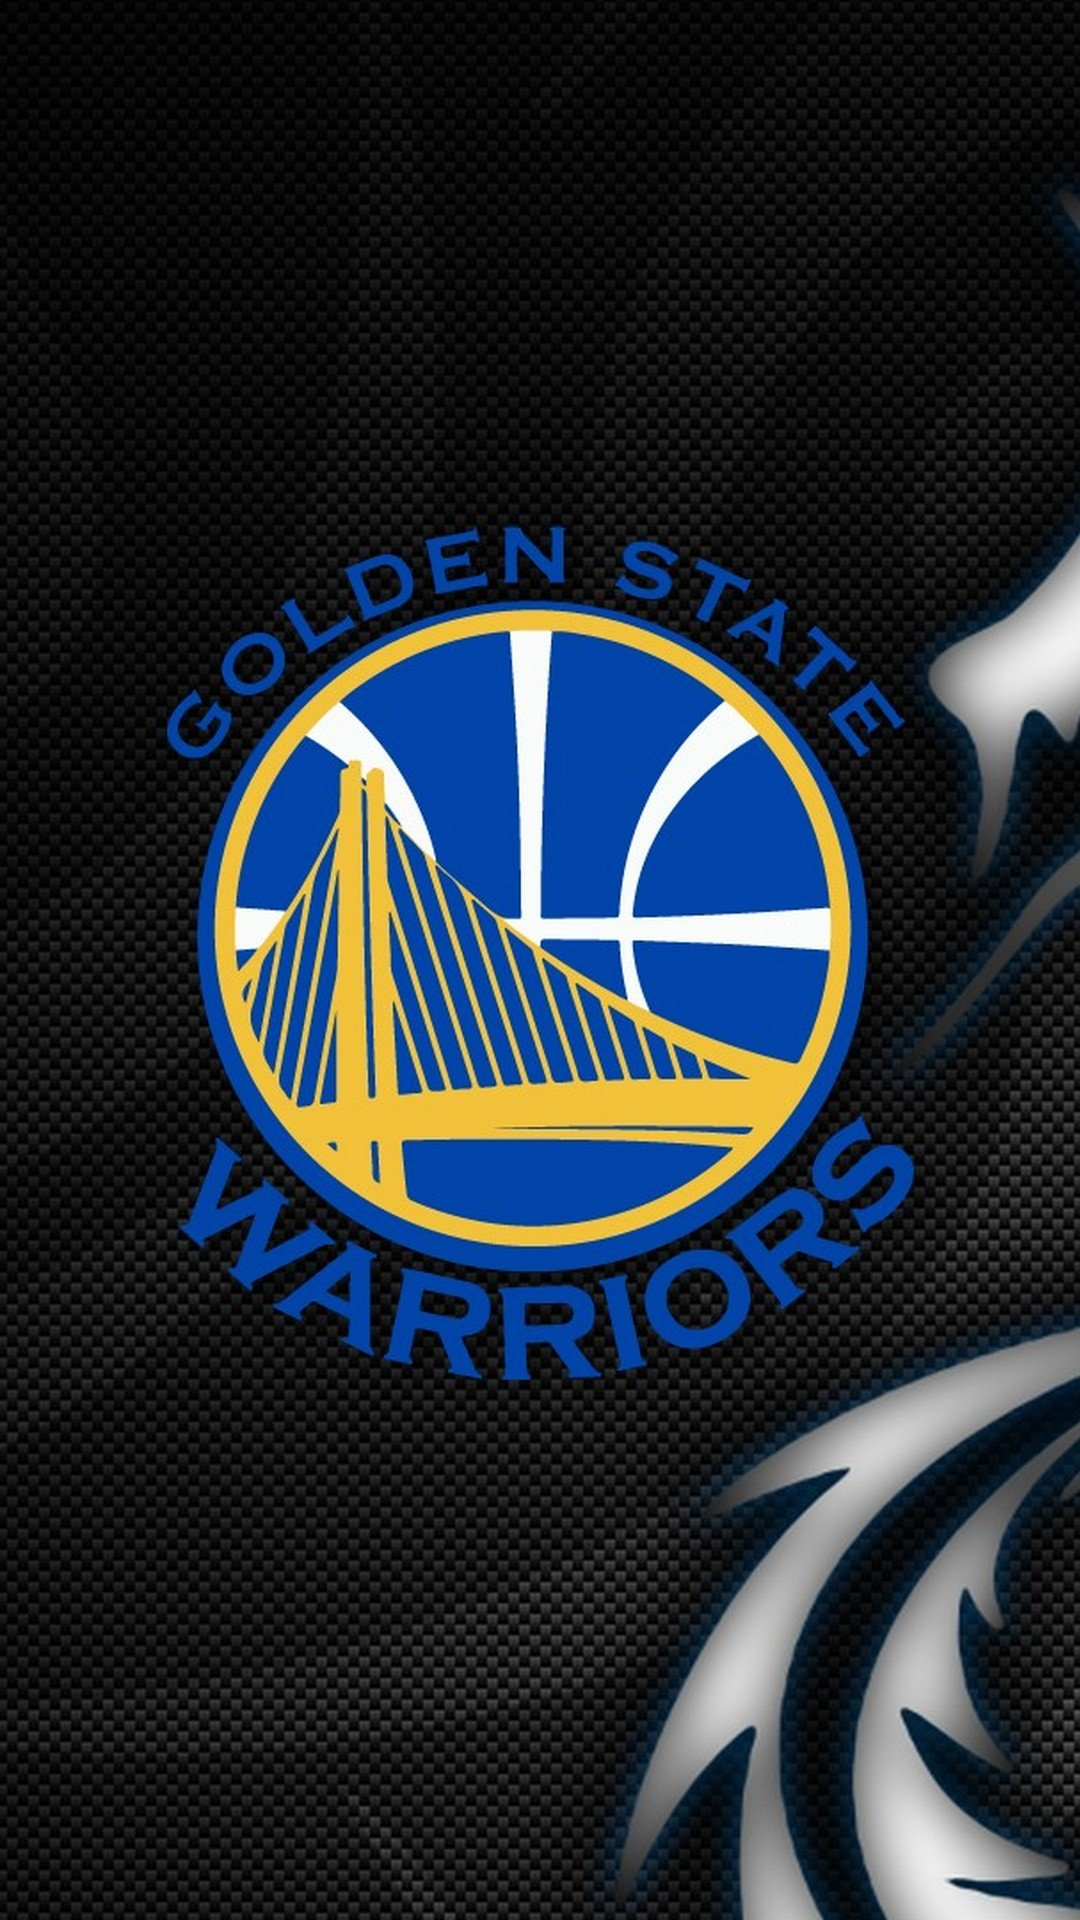 Golden State Warriors iPhone Wallpaper in HD   2020 NBA iPhone 1080x1920